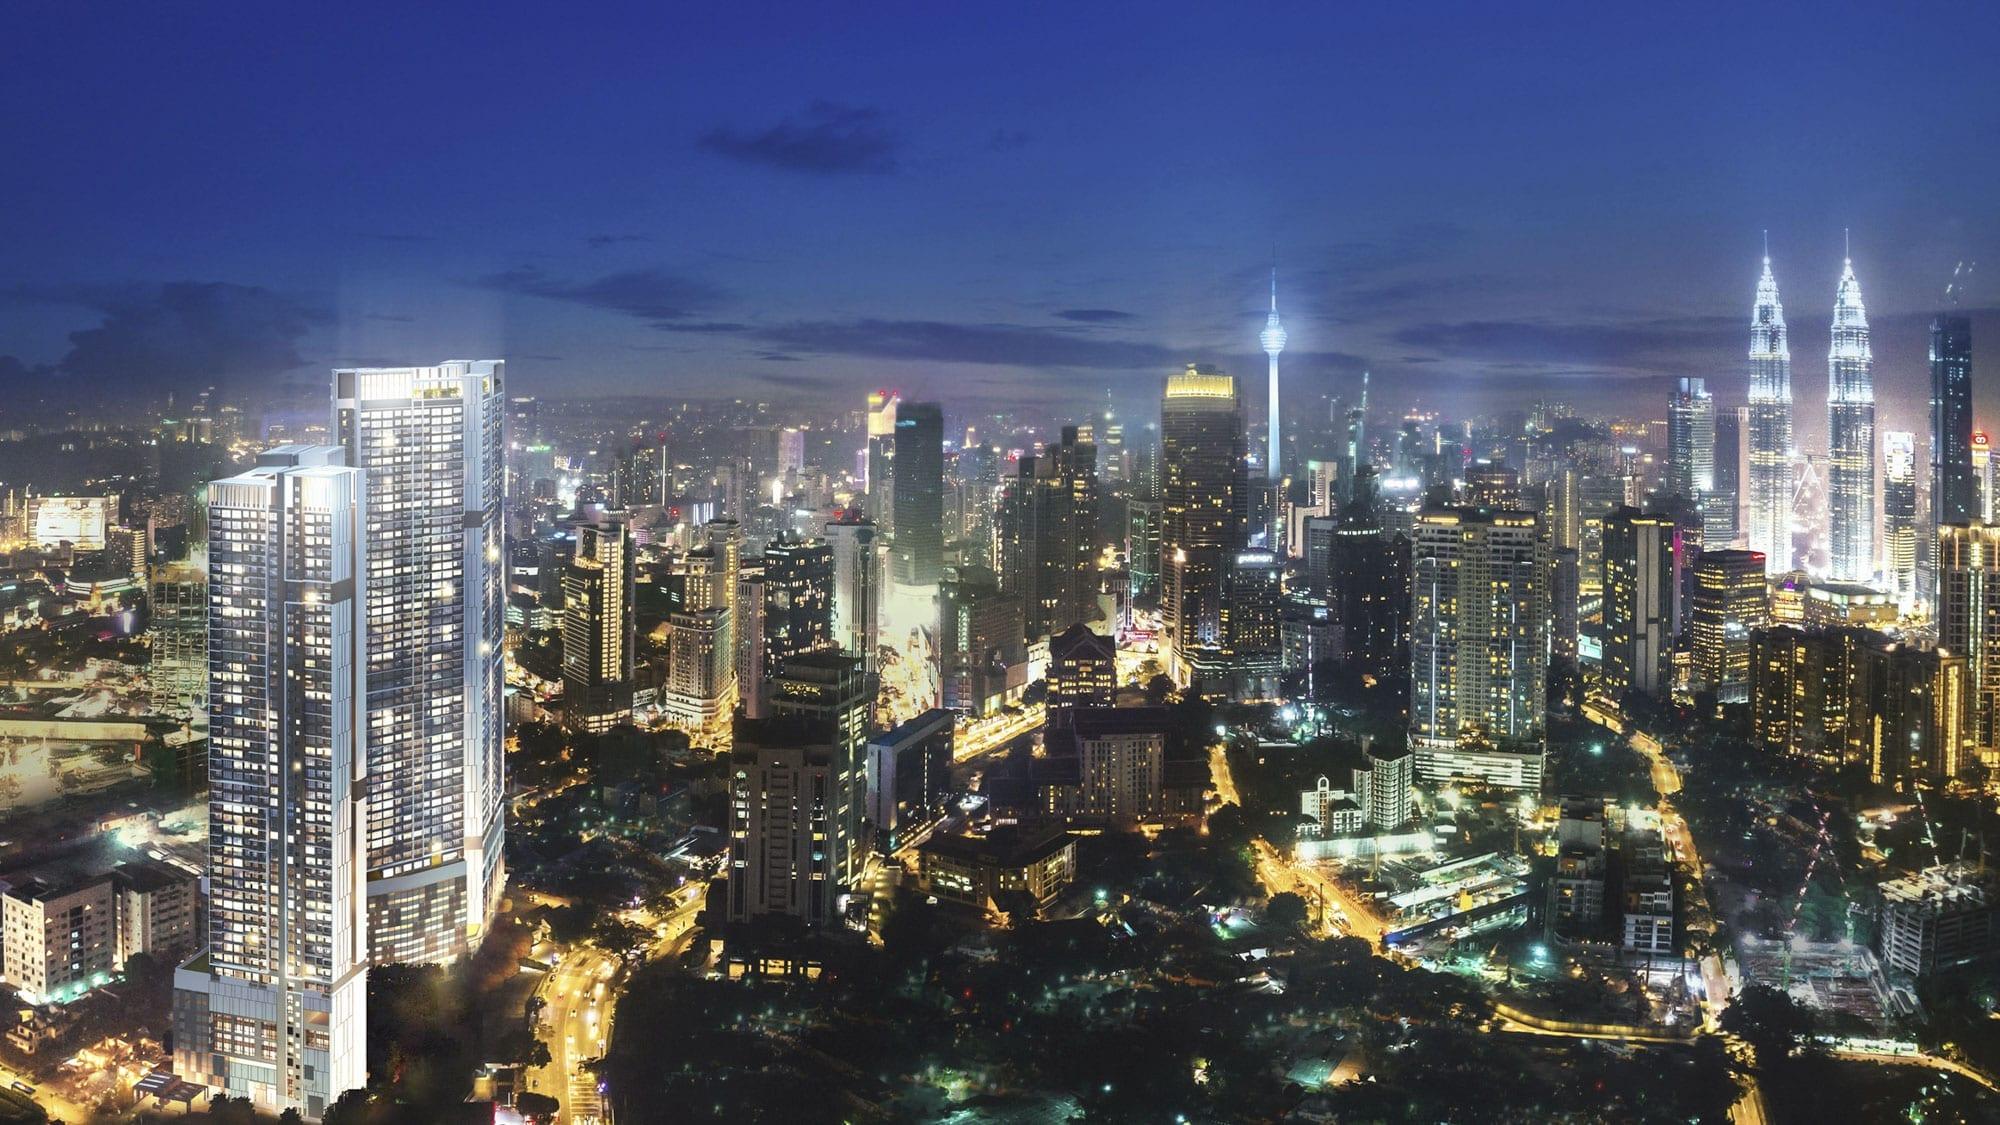 Agile Bukit Bintang Image 02